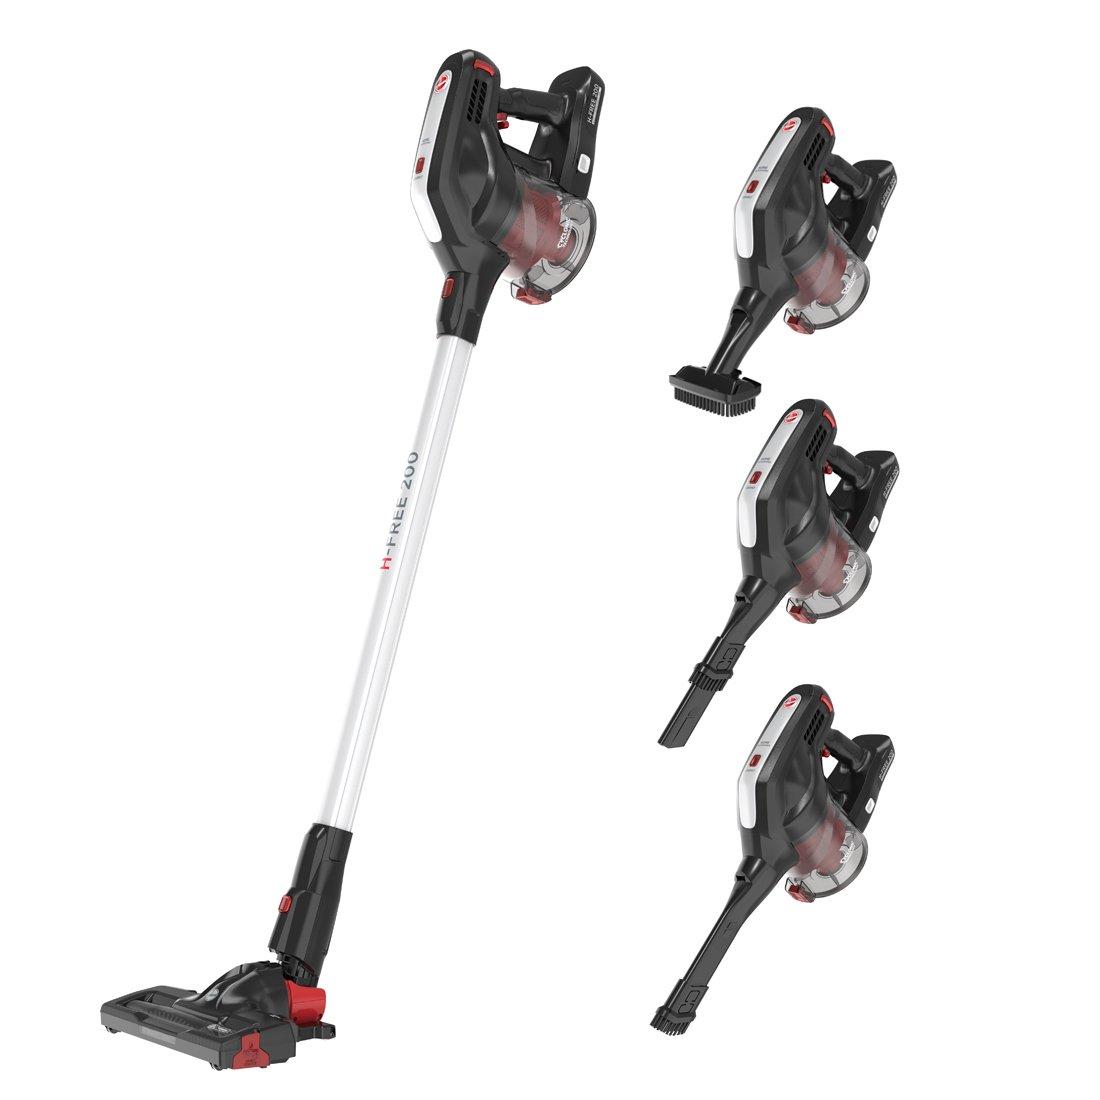 Hoover H-FREE 200 HF222RH Cordless Vacuum Cleaner